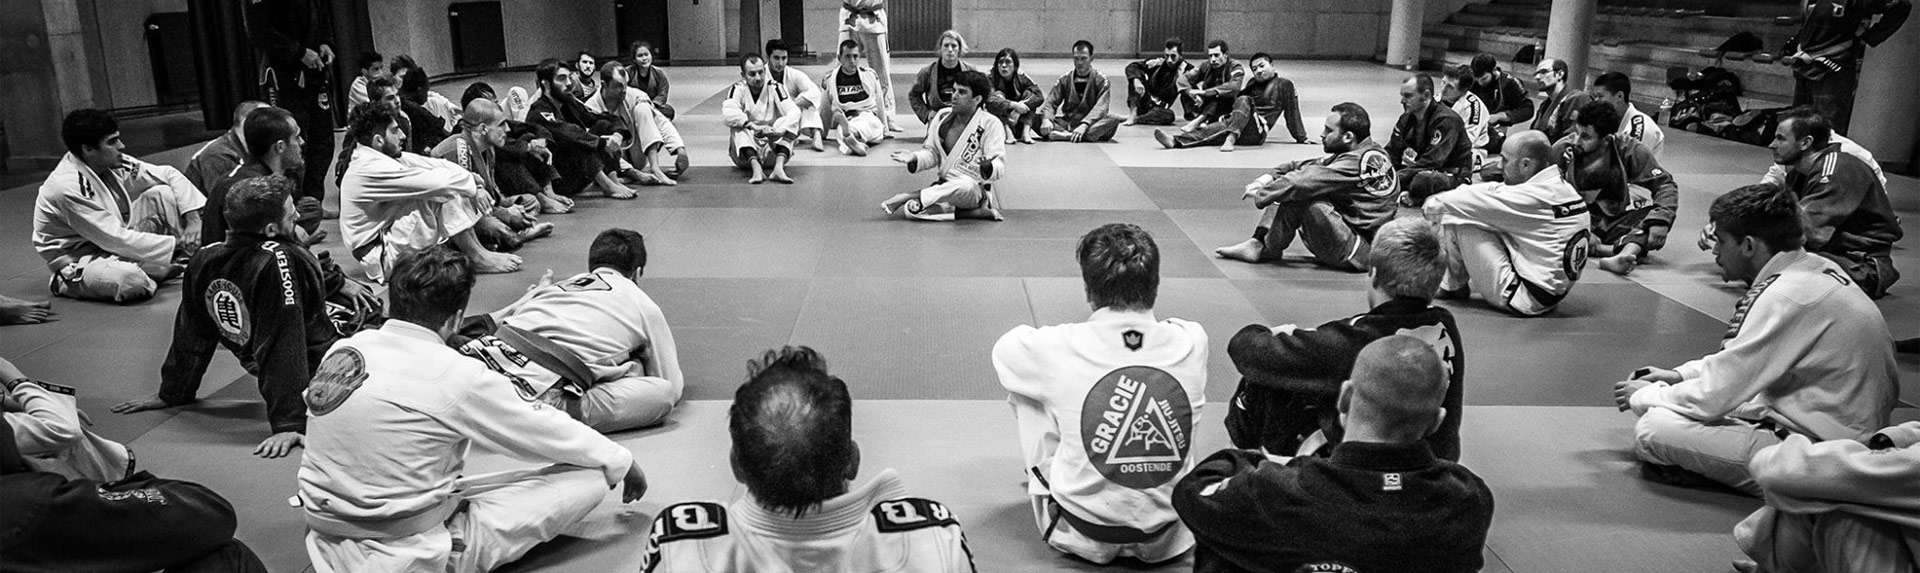 Brasa Brazilian Jiu Jitsu Leuven Belgium Martial Arts on the mat Felipe Costa seminar Wim Deputter